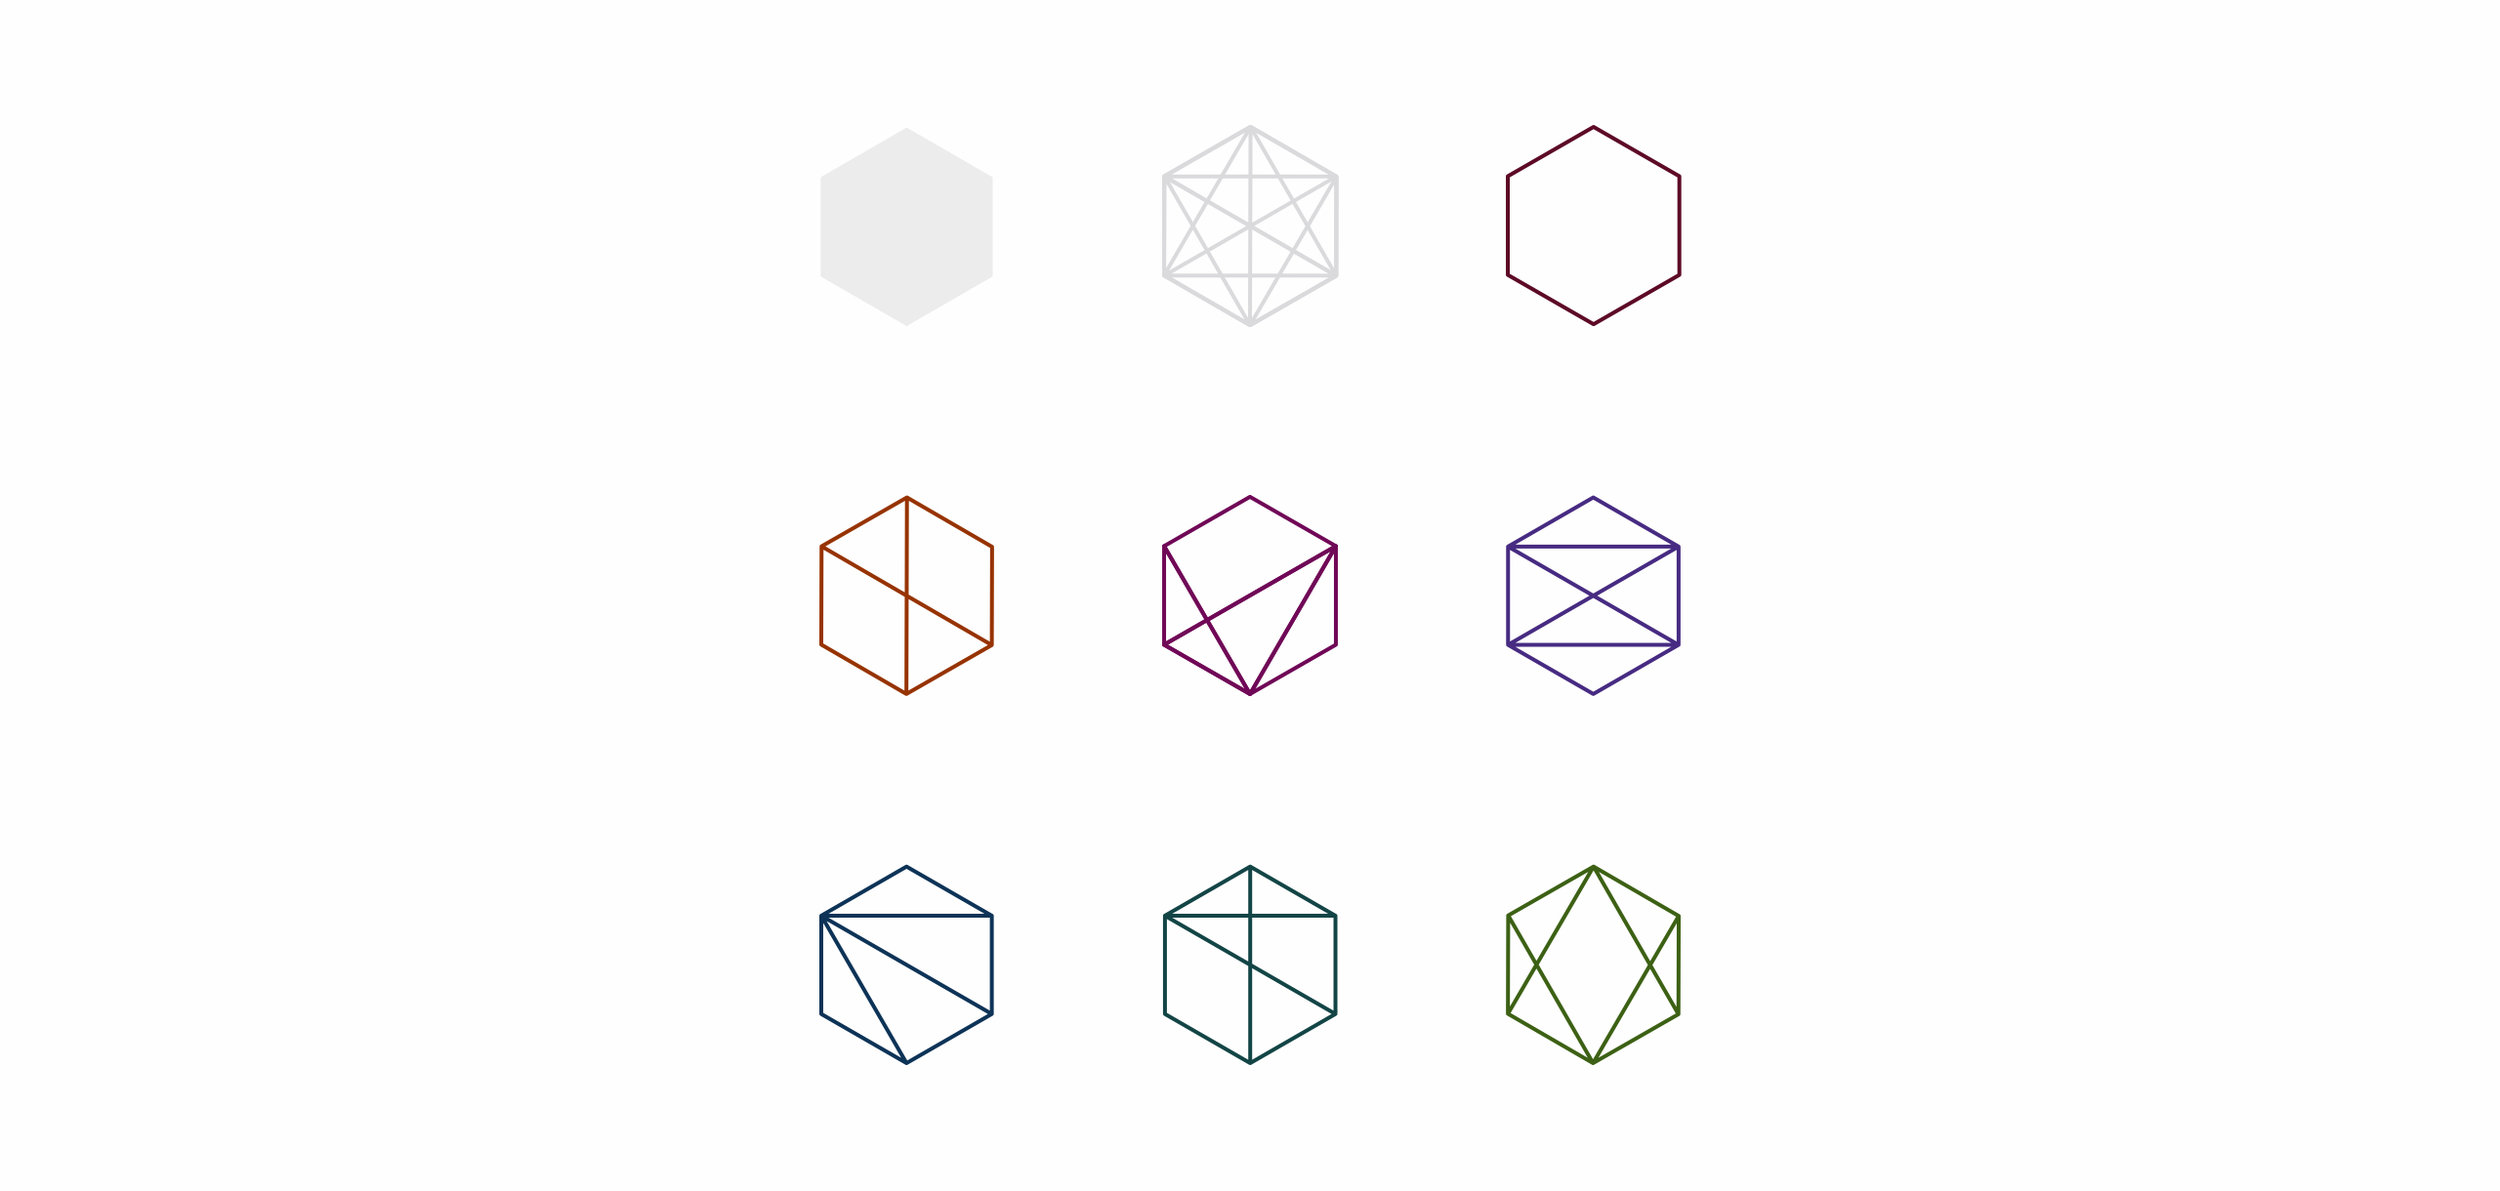 emds_brand-patterns-03@2x.jpg